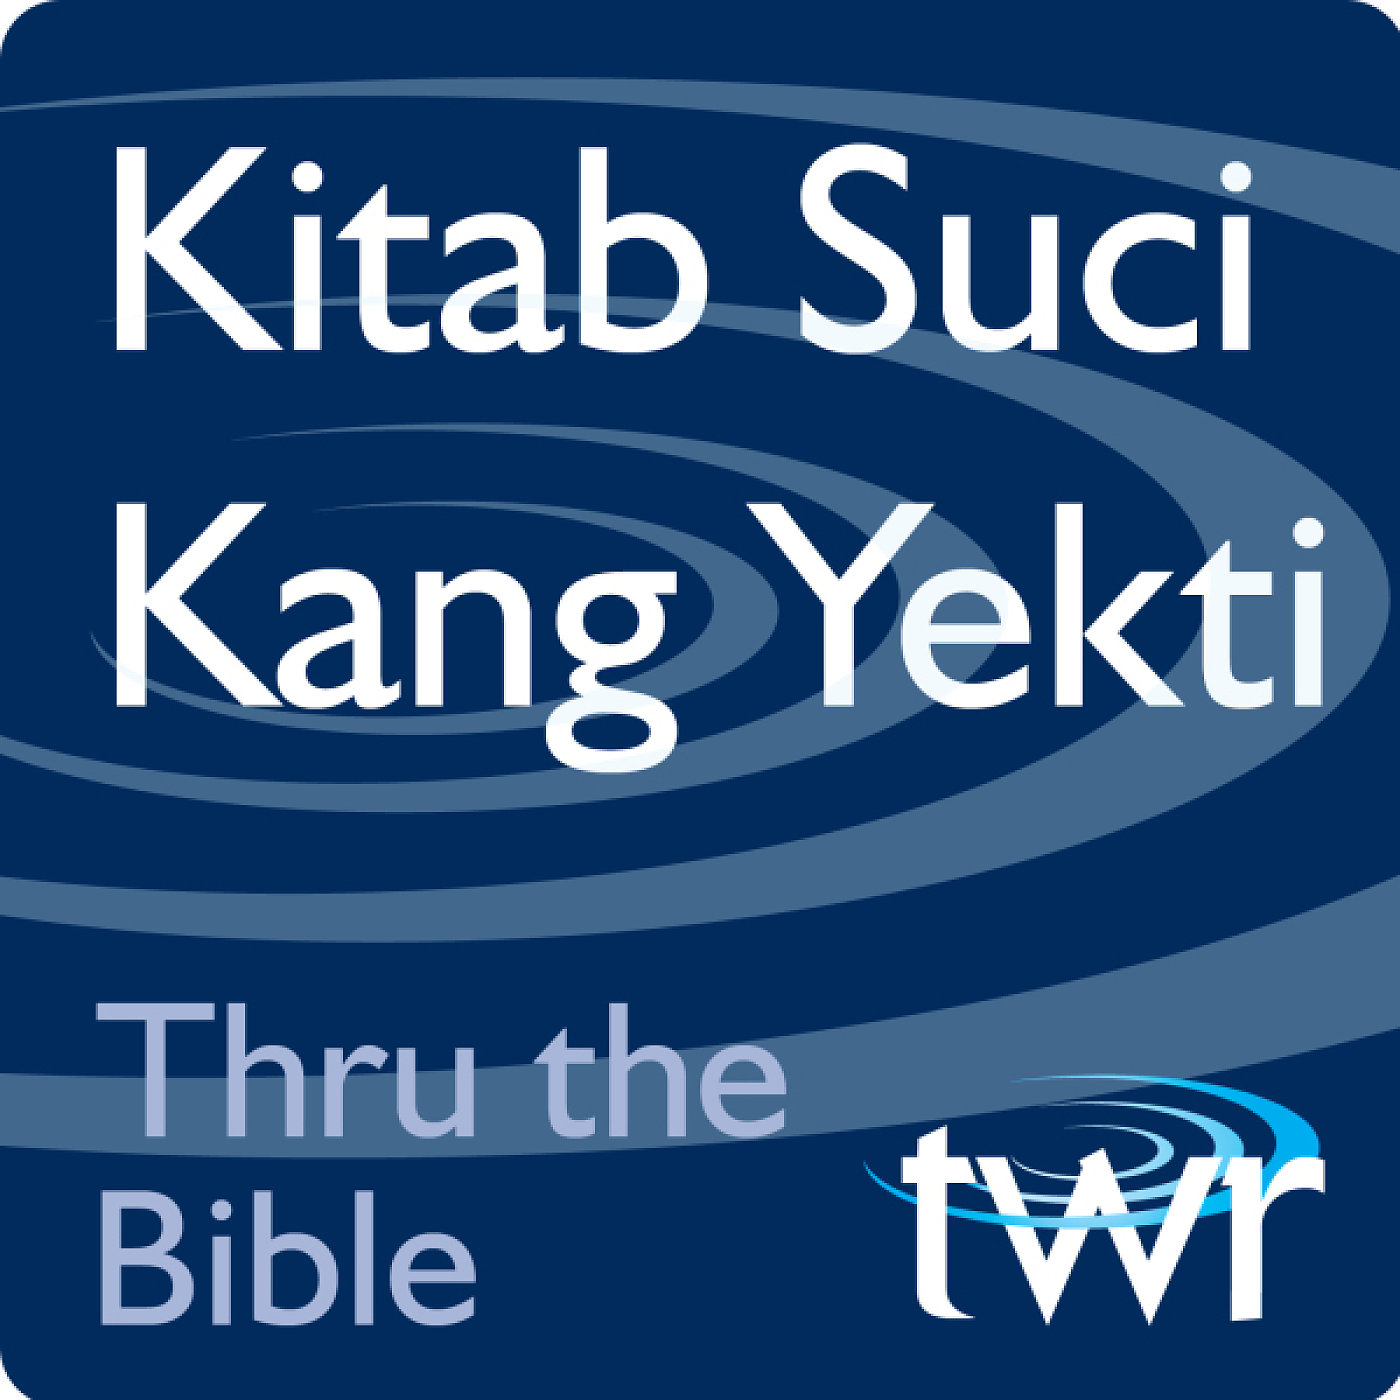 Kitab Suci Kang Yekti @ ttb.twr.org/javanese